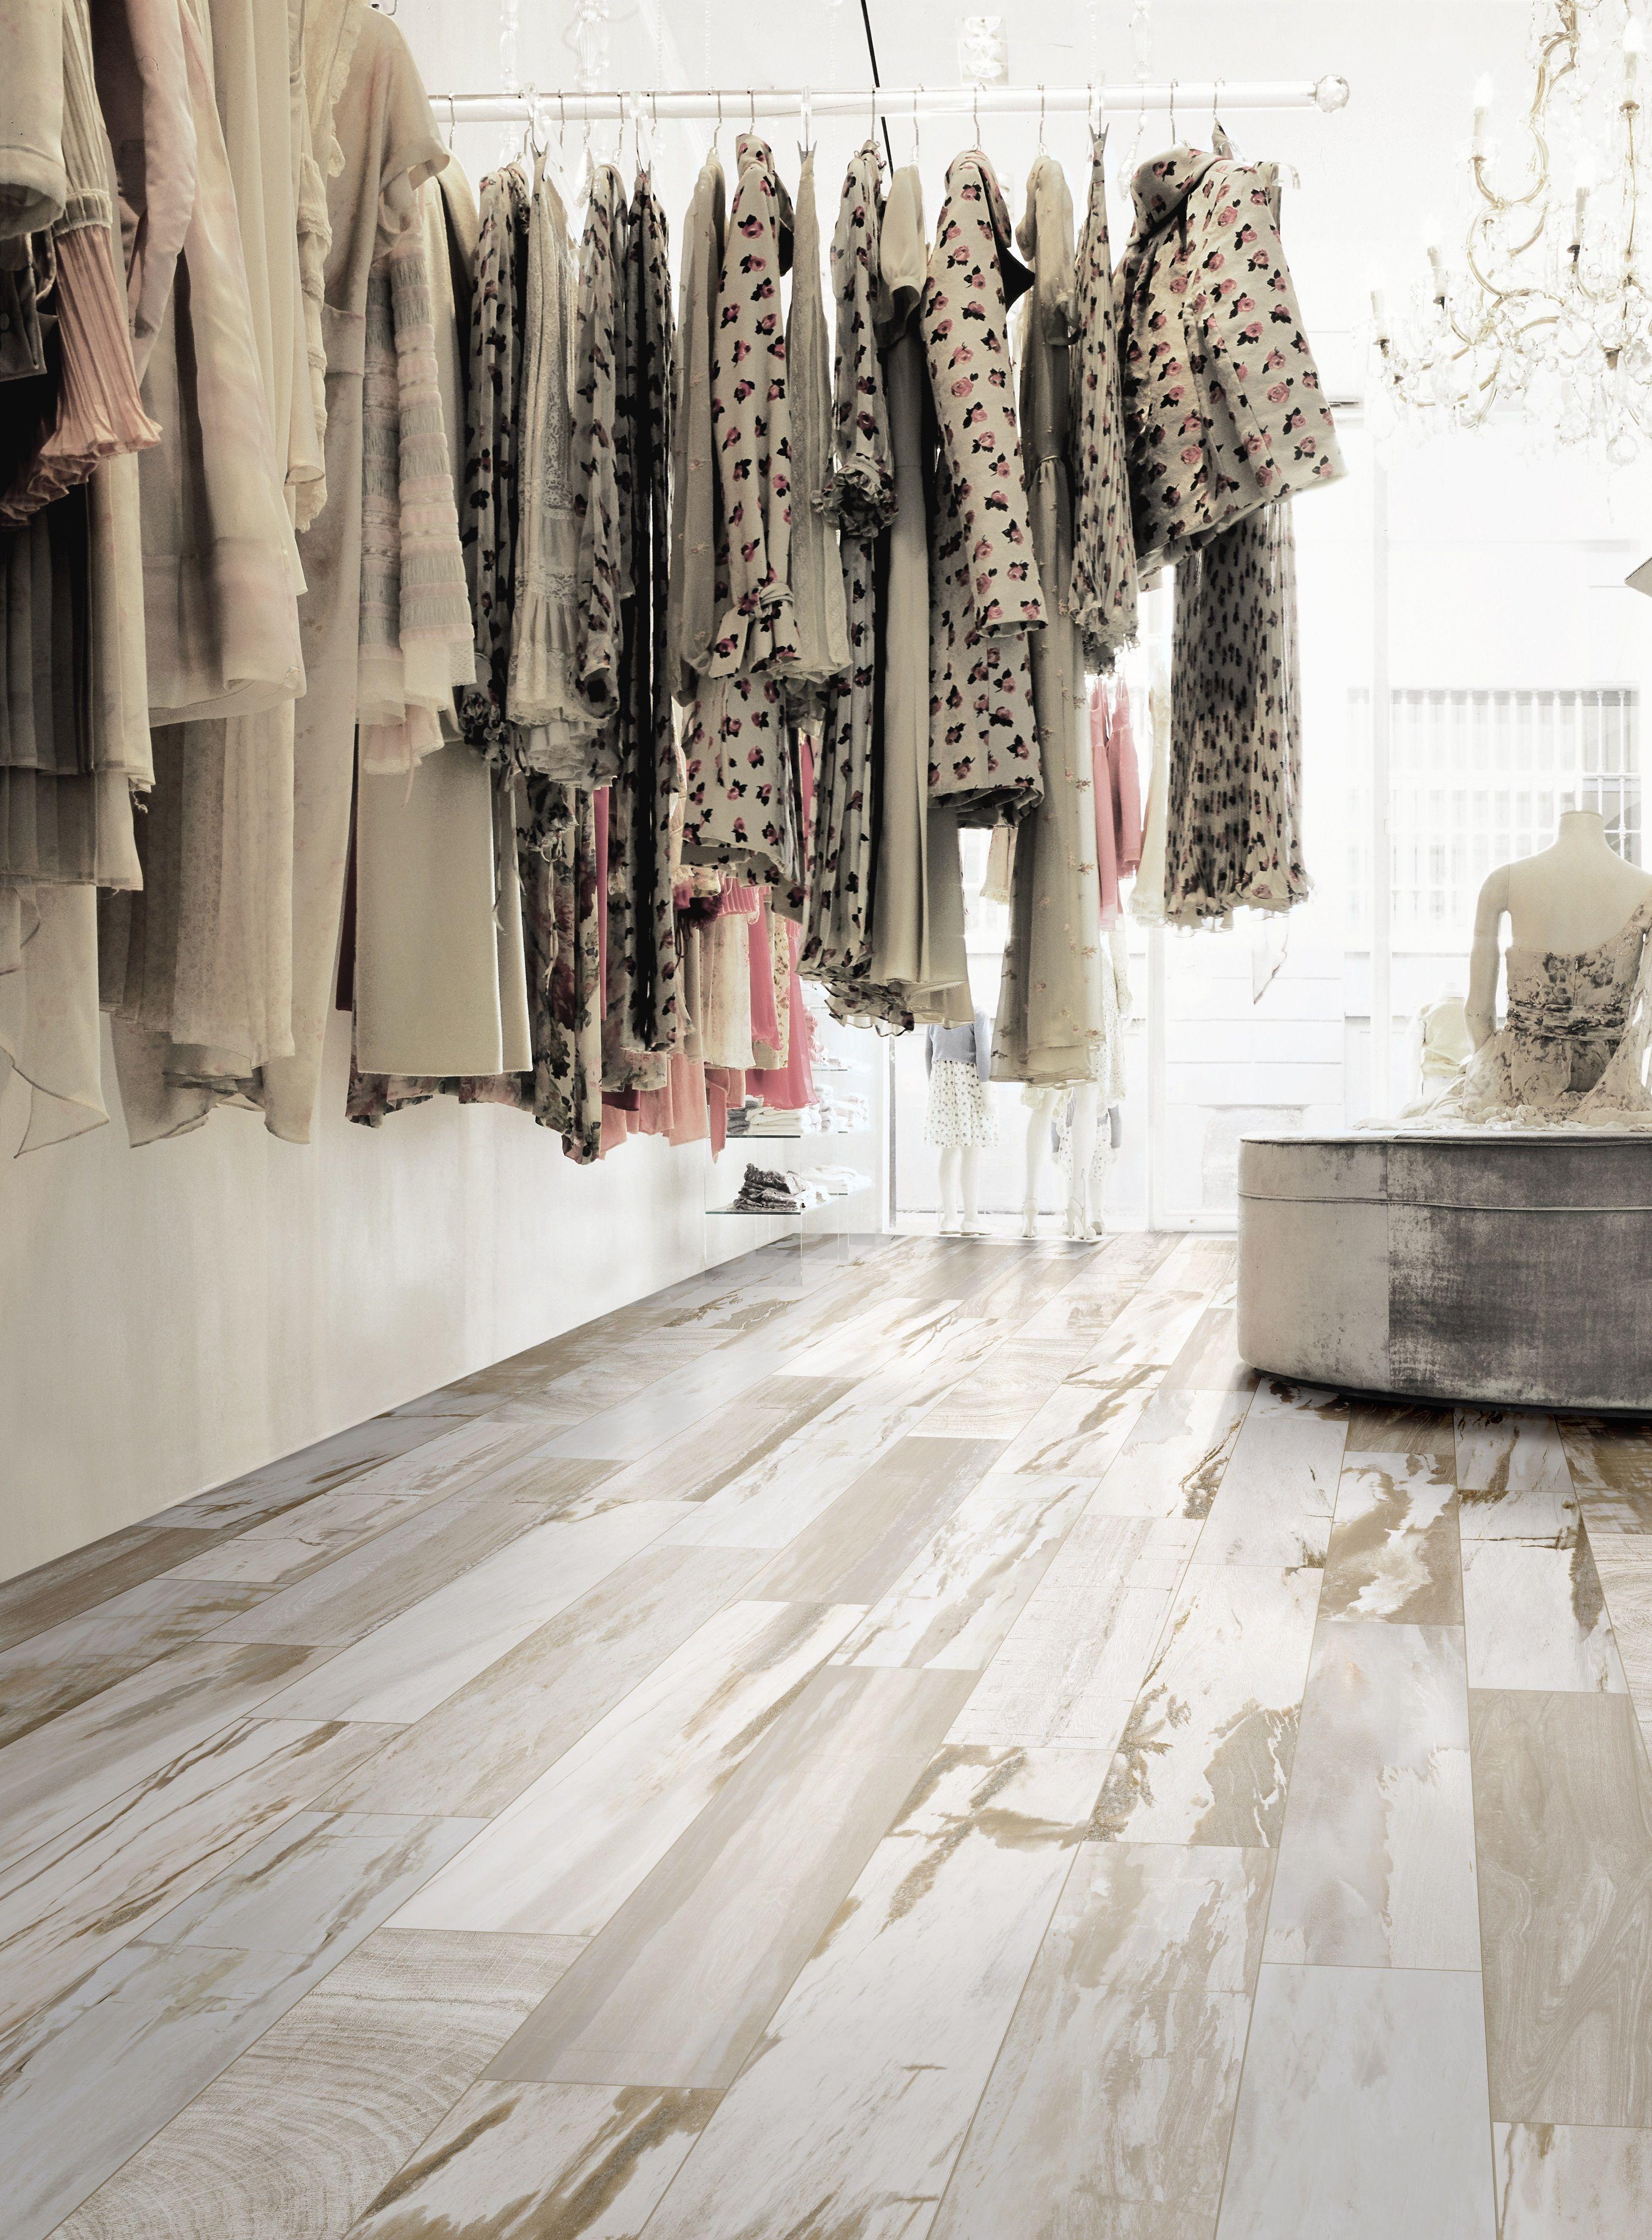 Wow summer 6x36 tile plank floors retaildesign interiordesign wow summer 6x36 tile plank floors retaildesign interiordesign boutique dailygadgetfo Images